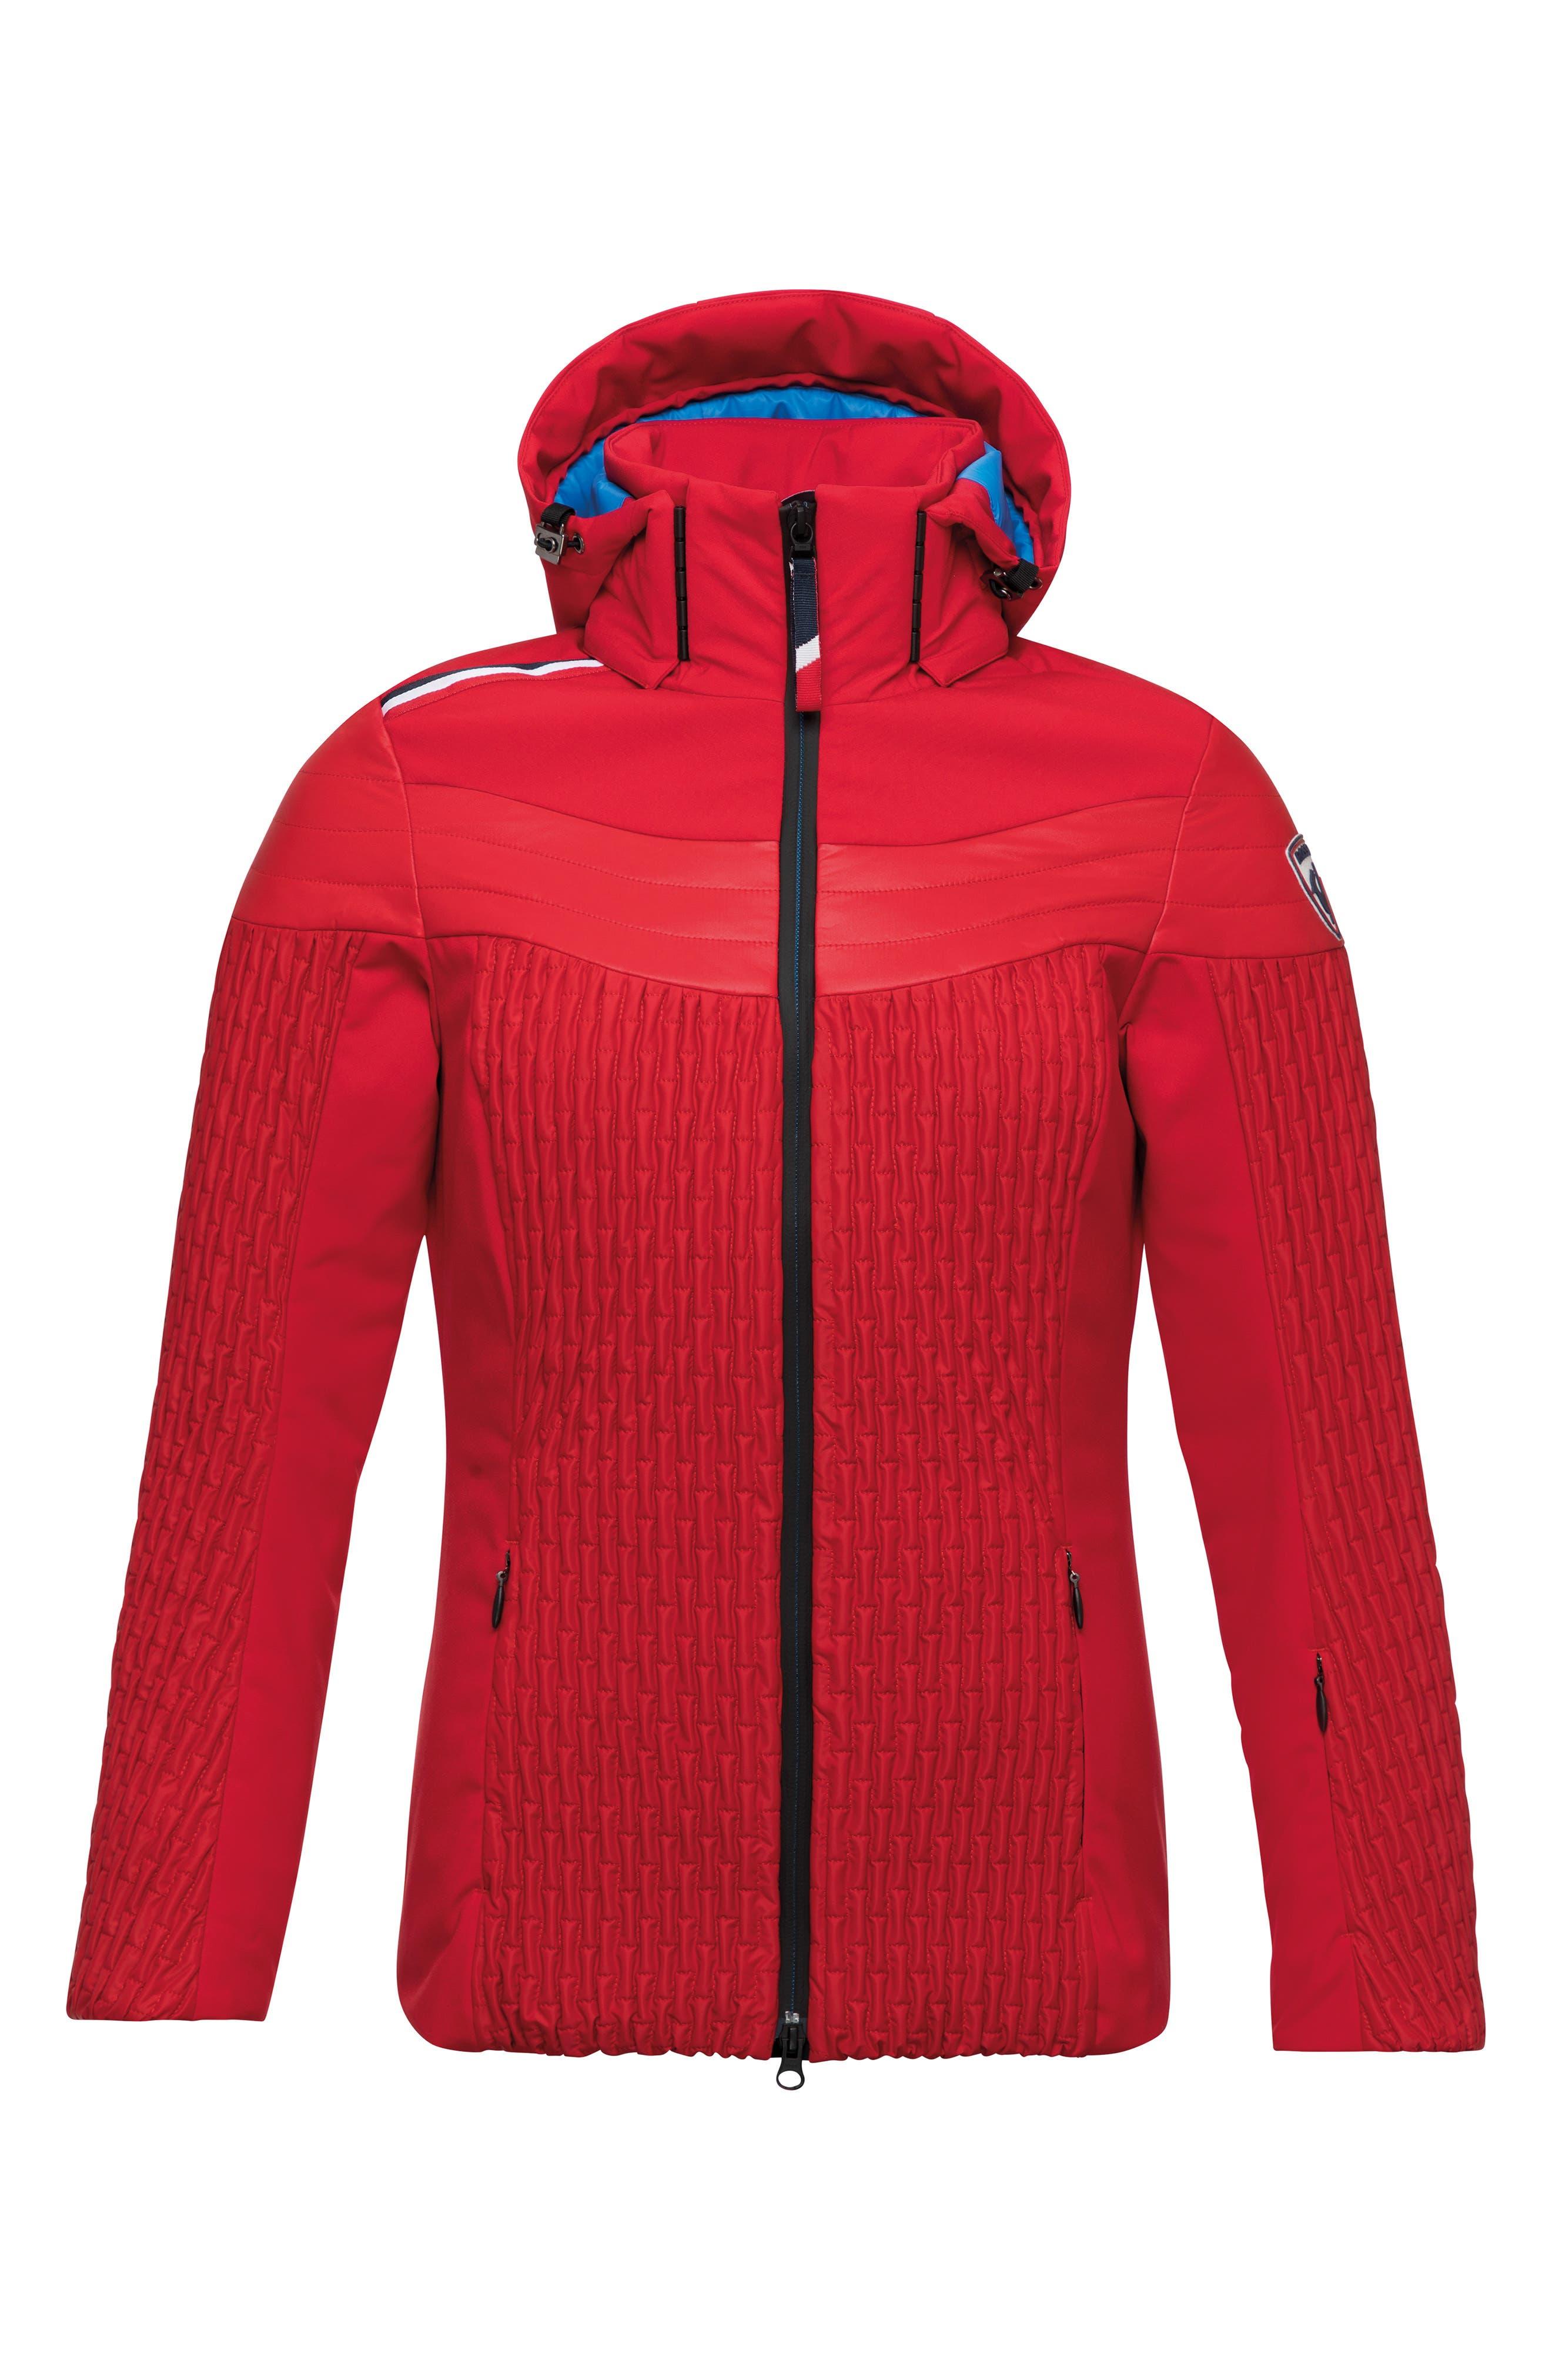 Cinetic Waterproof Hooded Ski Jacket,                             Main thumbnail 1, color,                             RED